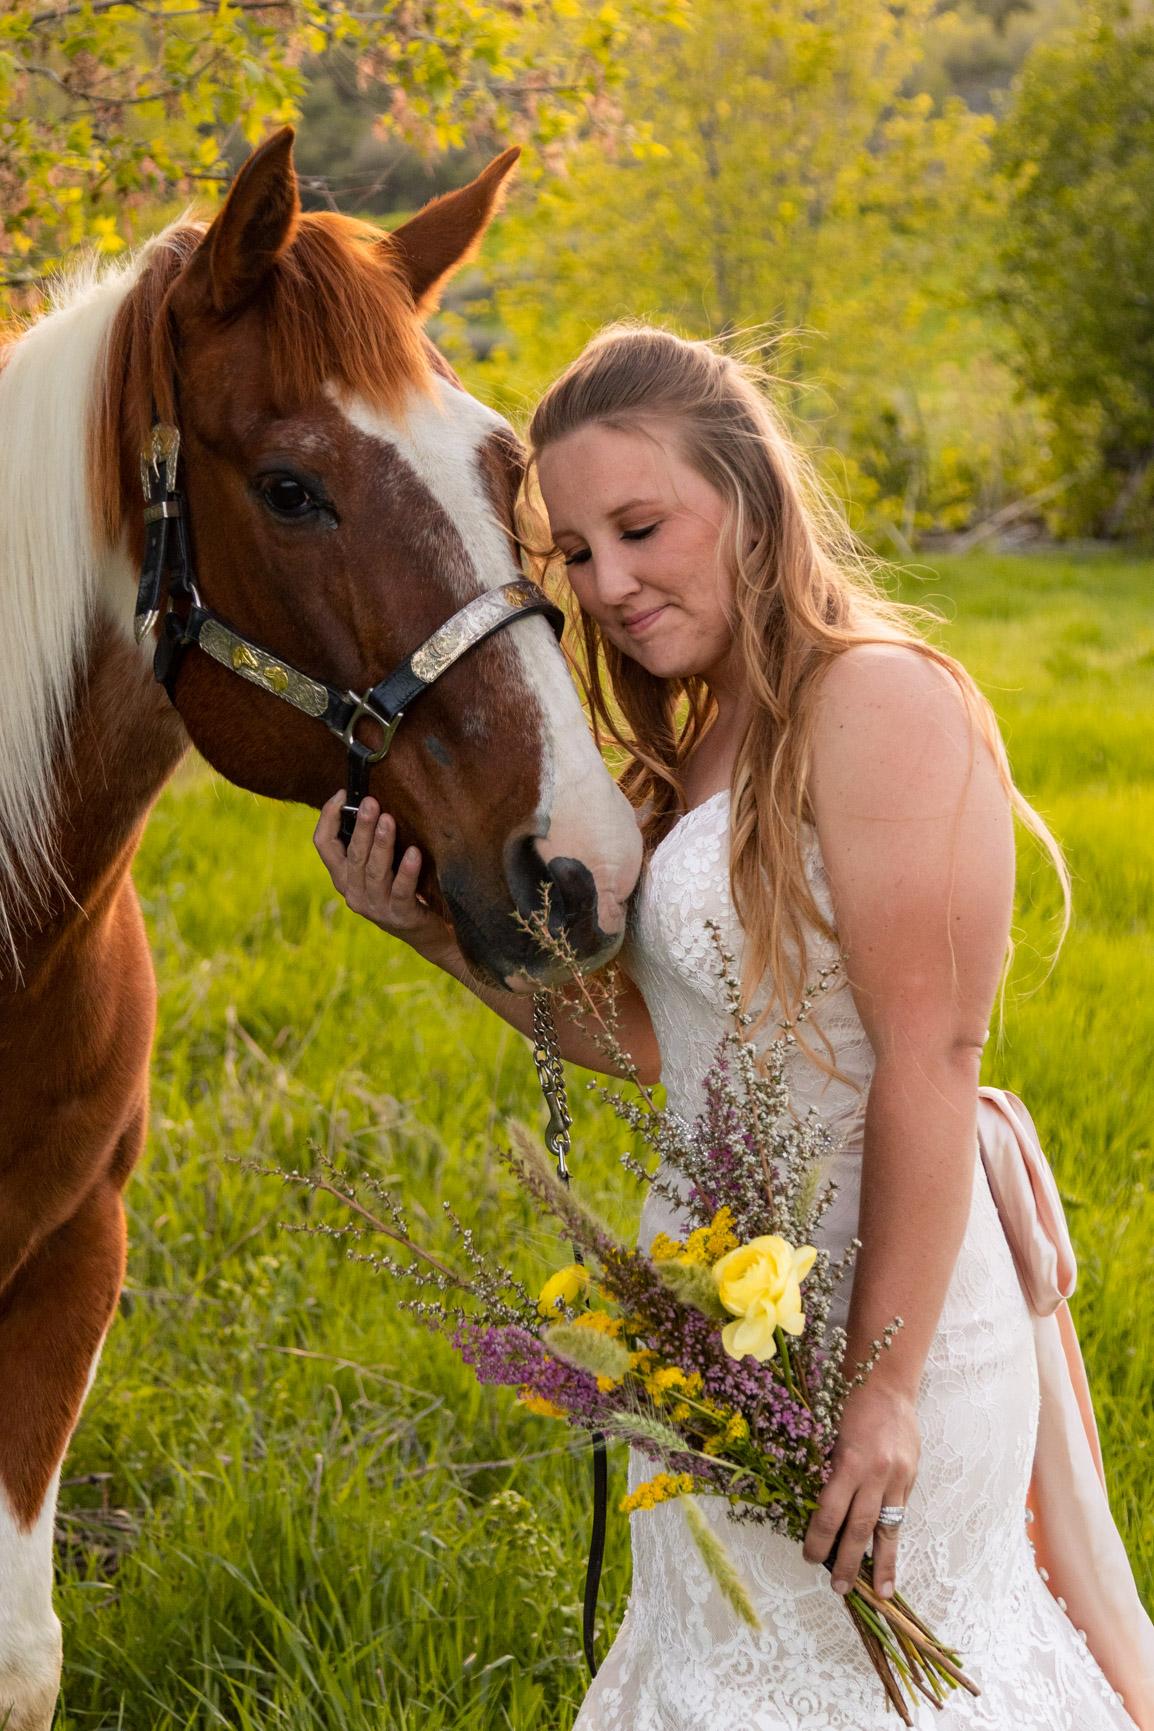 Rustic Wild Wedding Bouquet Elopement Rocky Mountains Wasatch Mountains Utah Halie West Photography 2